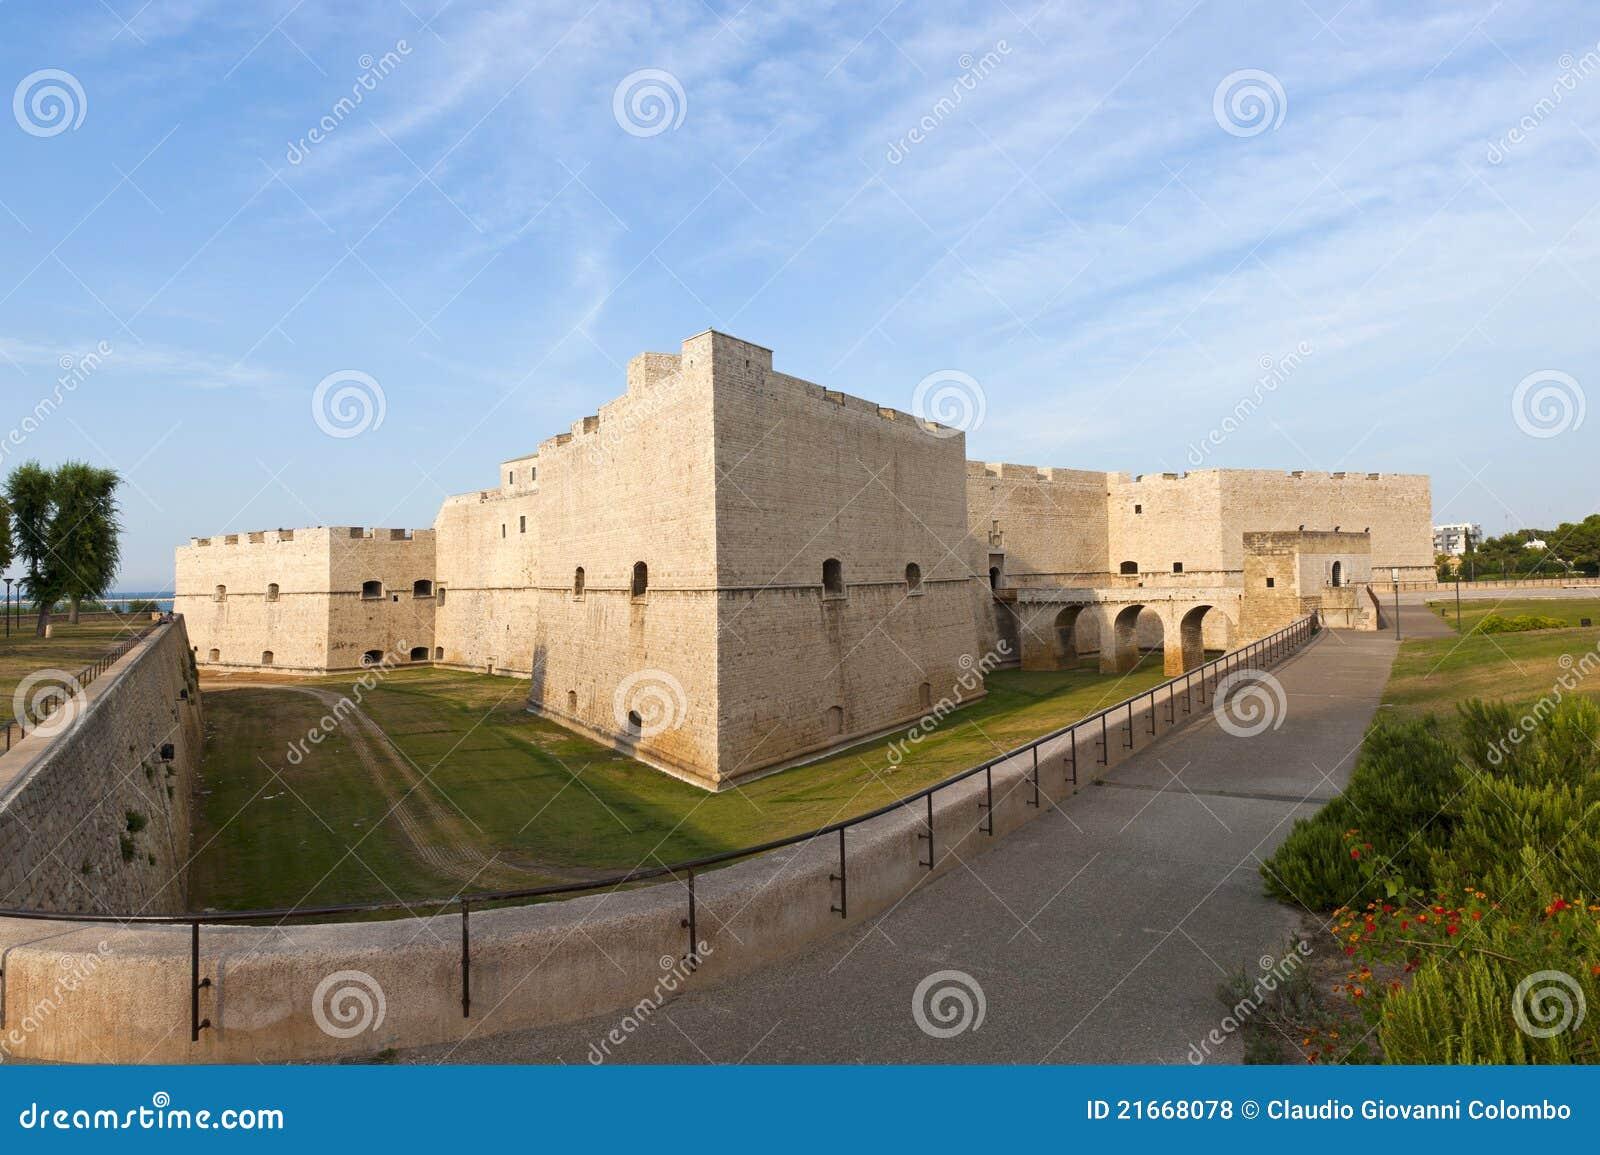 Barletta (Apulia, Italy) - castelo medieval